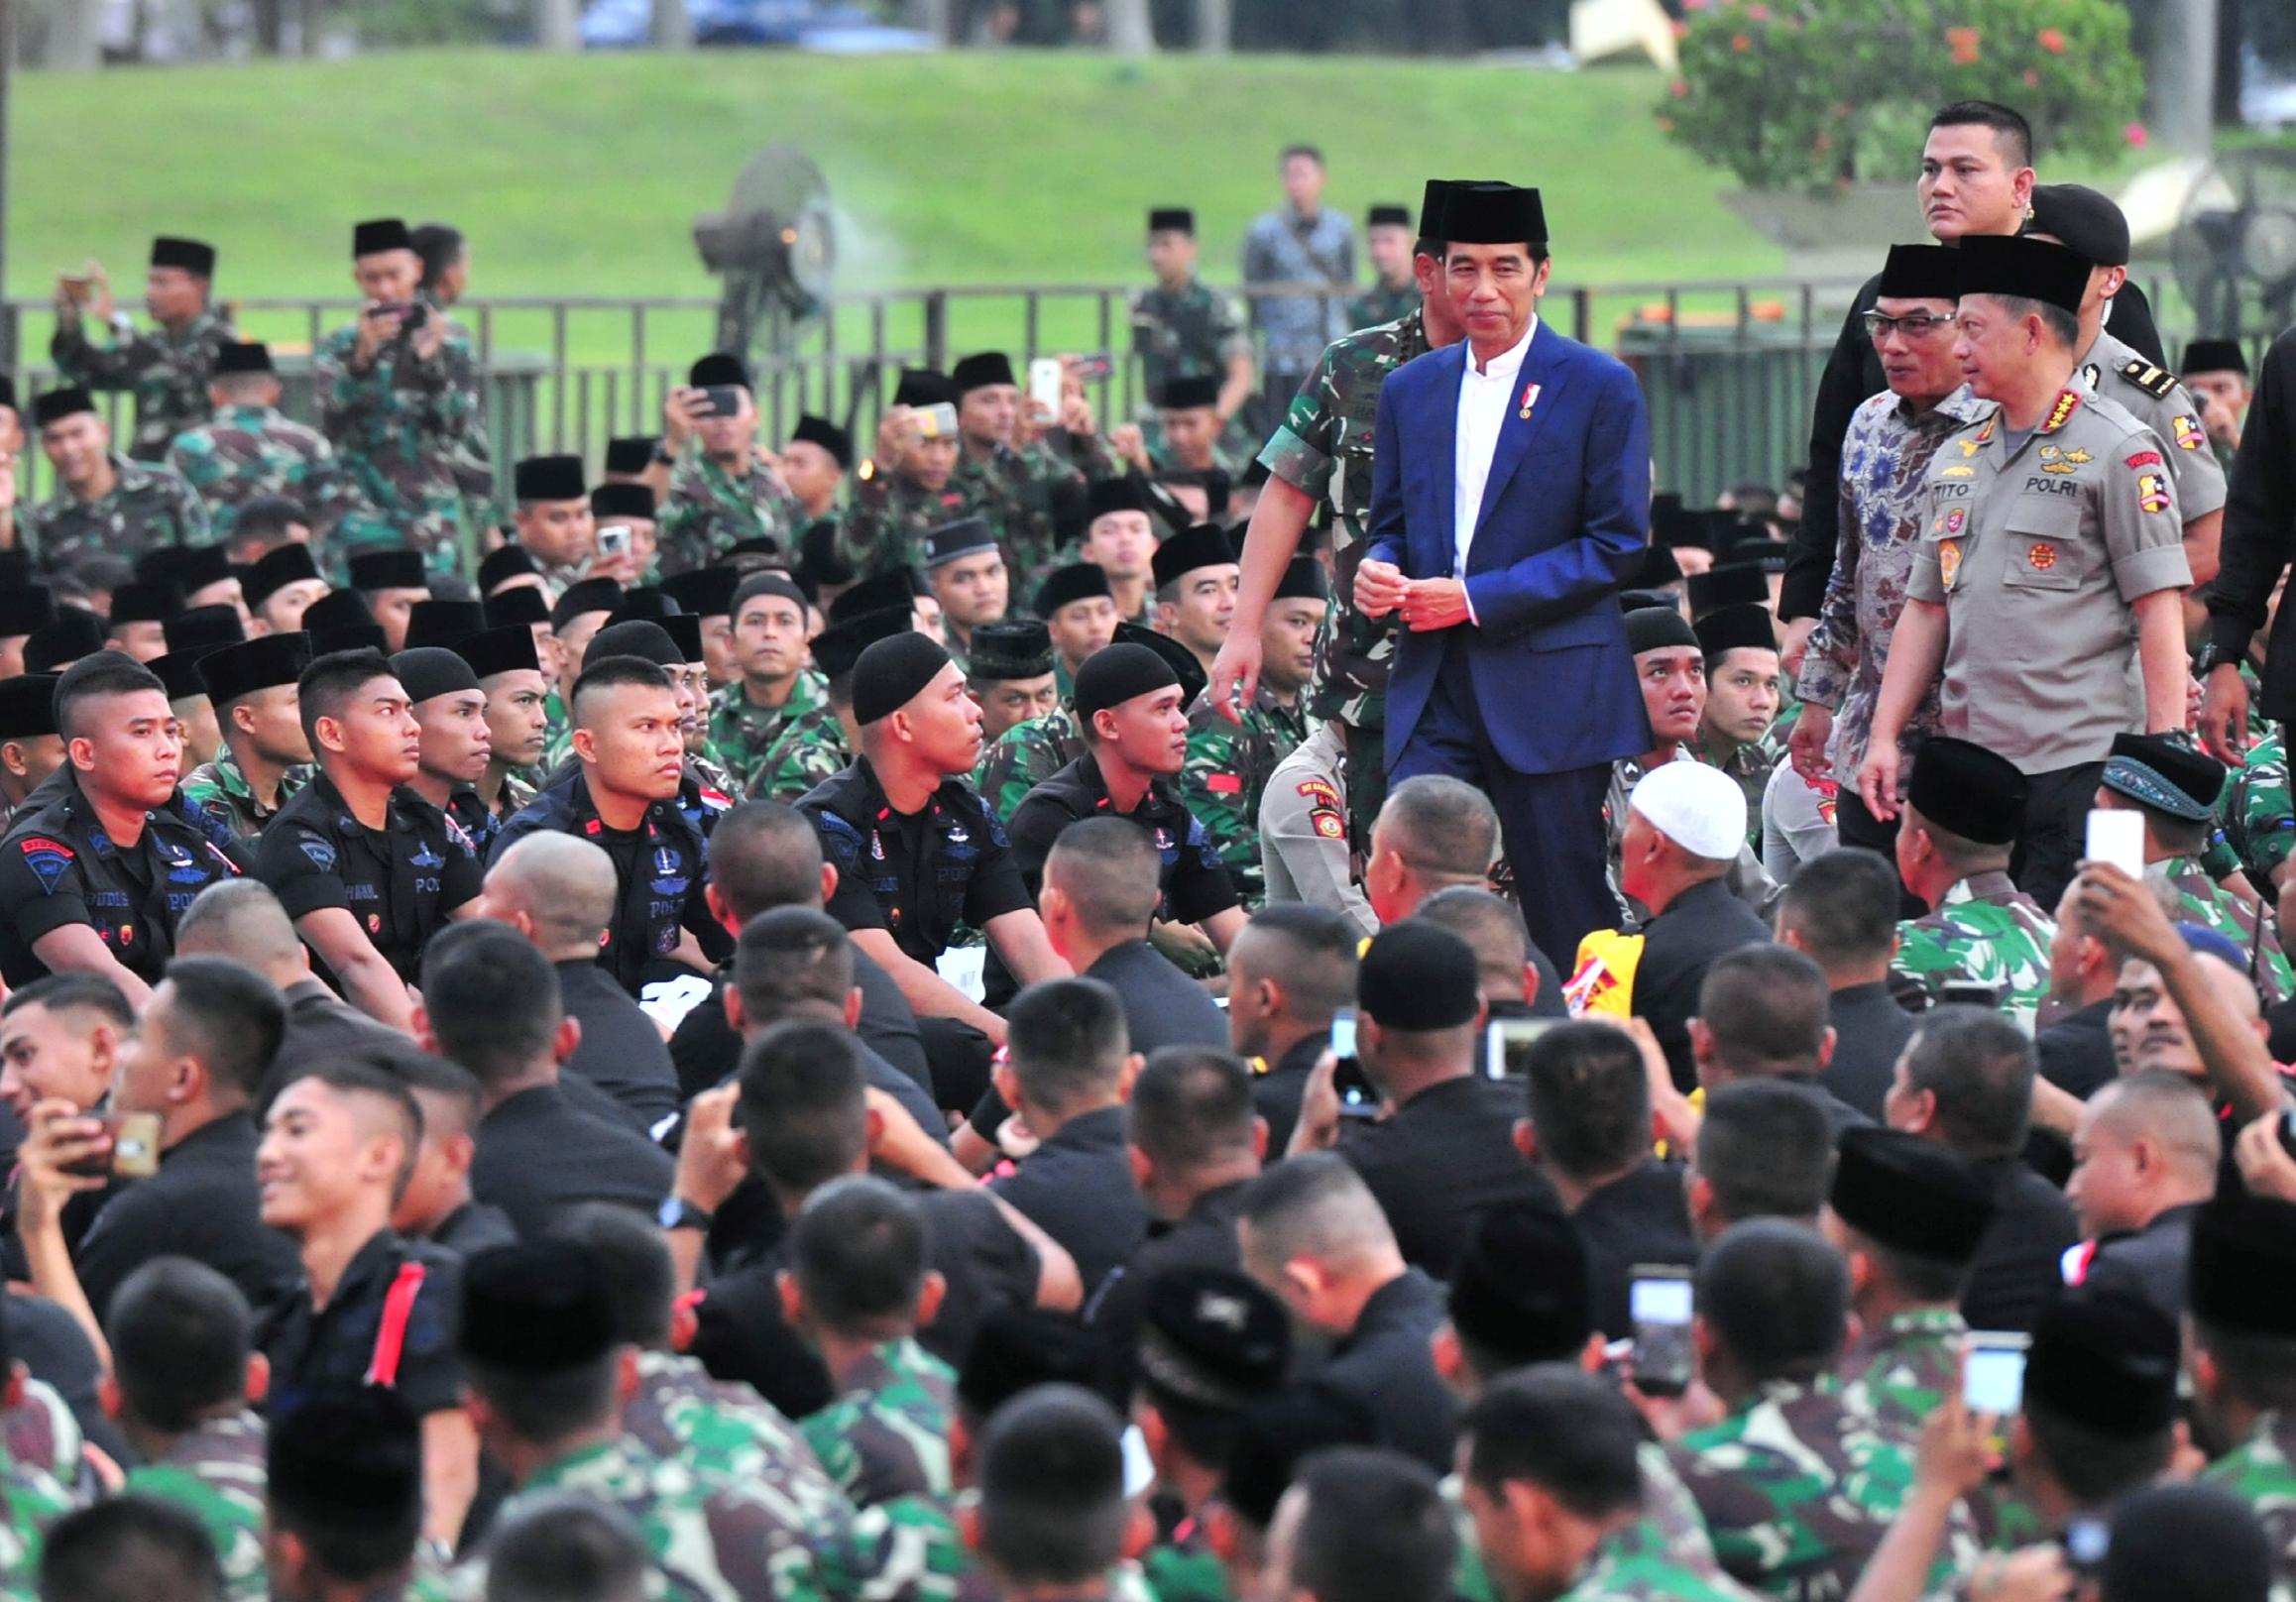 Presiden Jokowi: Rakyat Senang Lihat TNI dan Polri Solid dan Sangat Bersatu